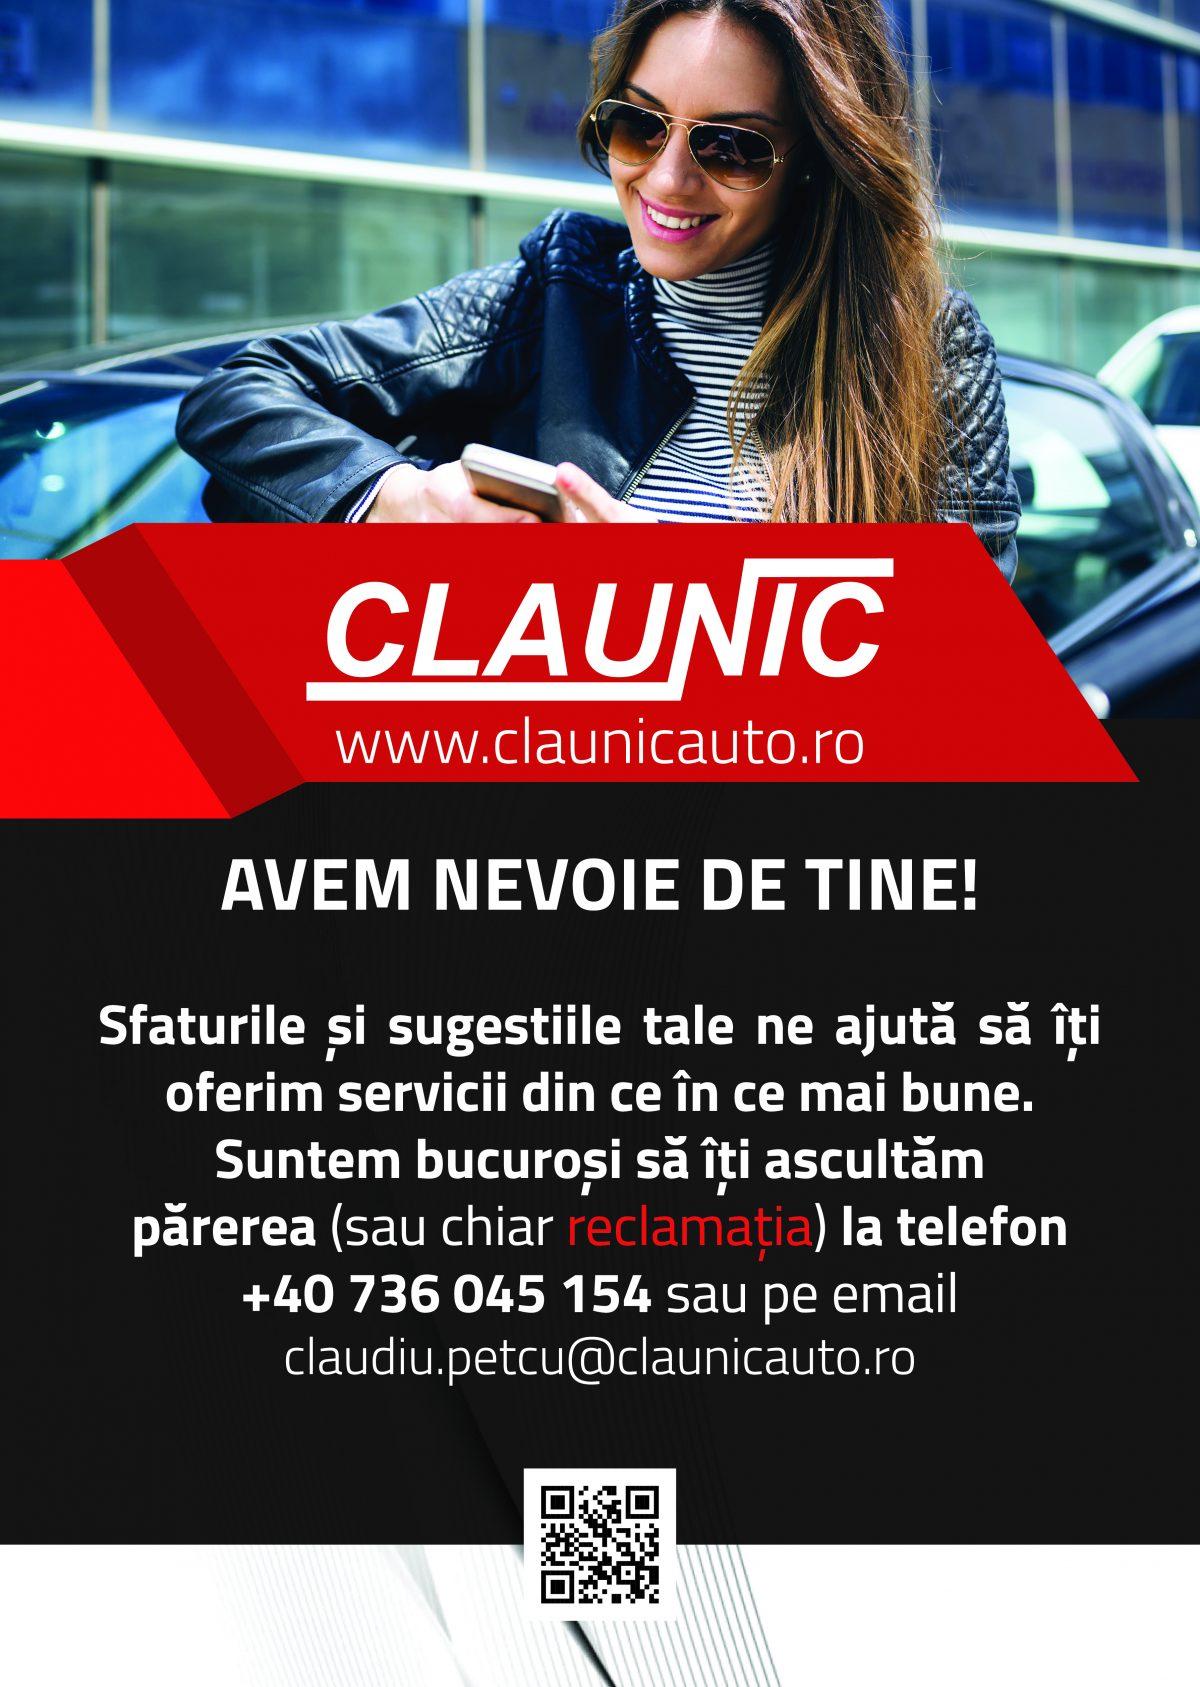 Claunic